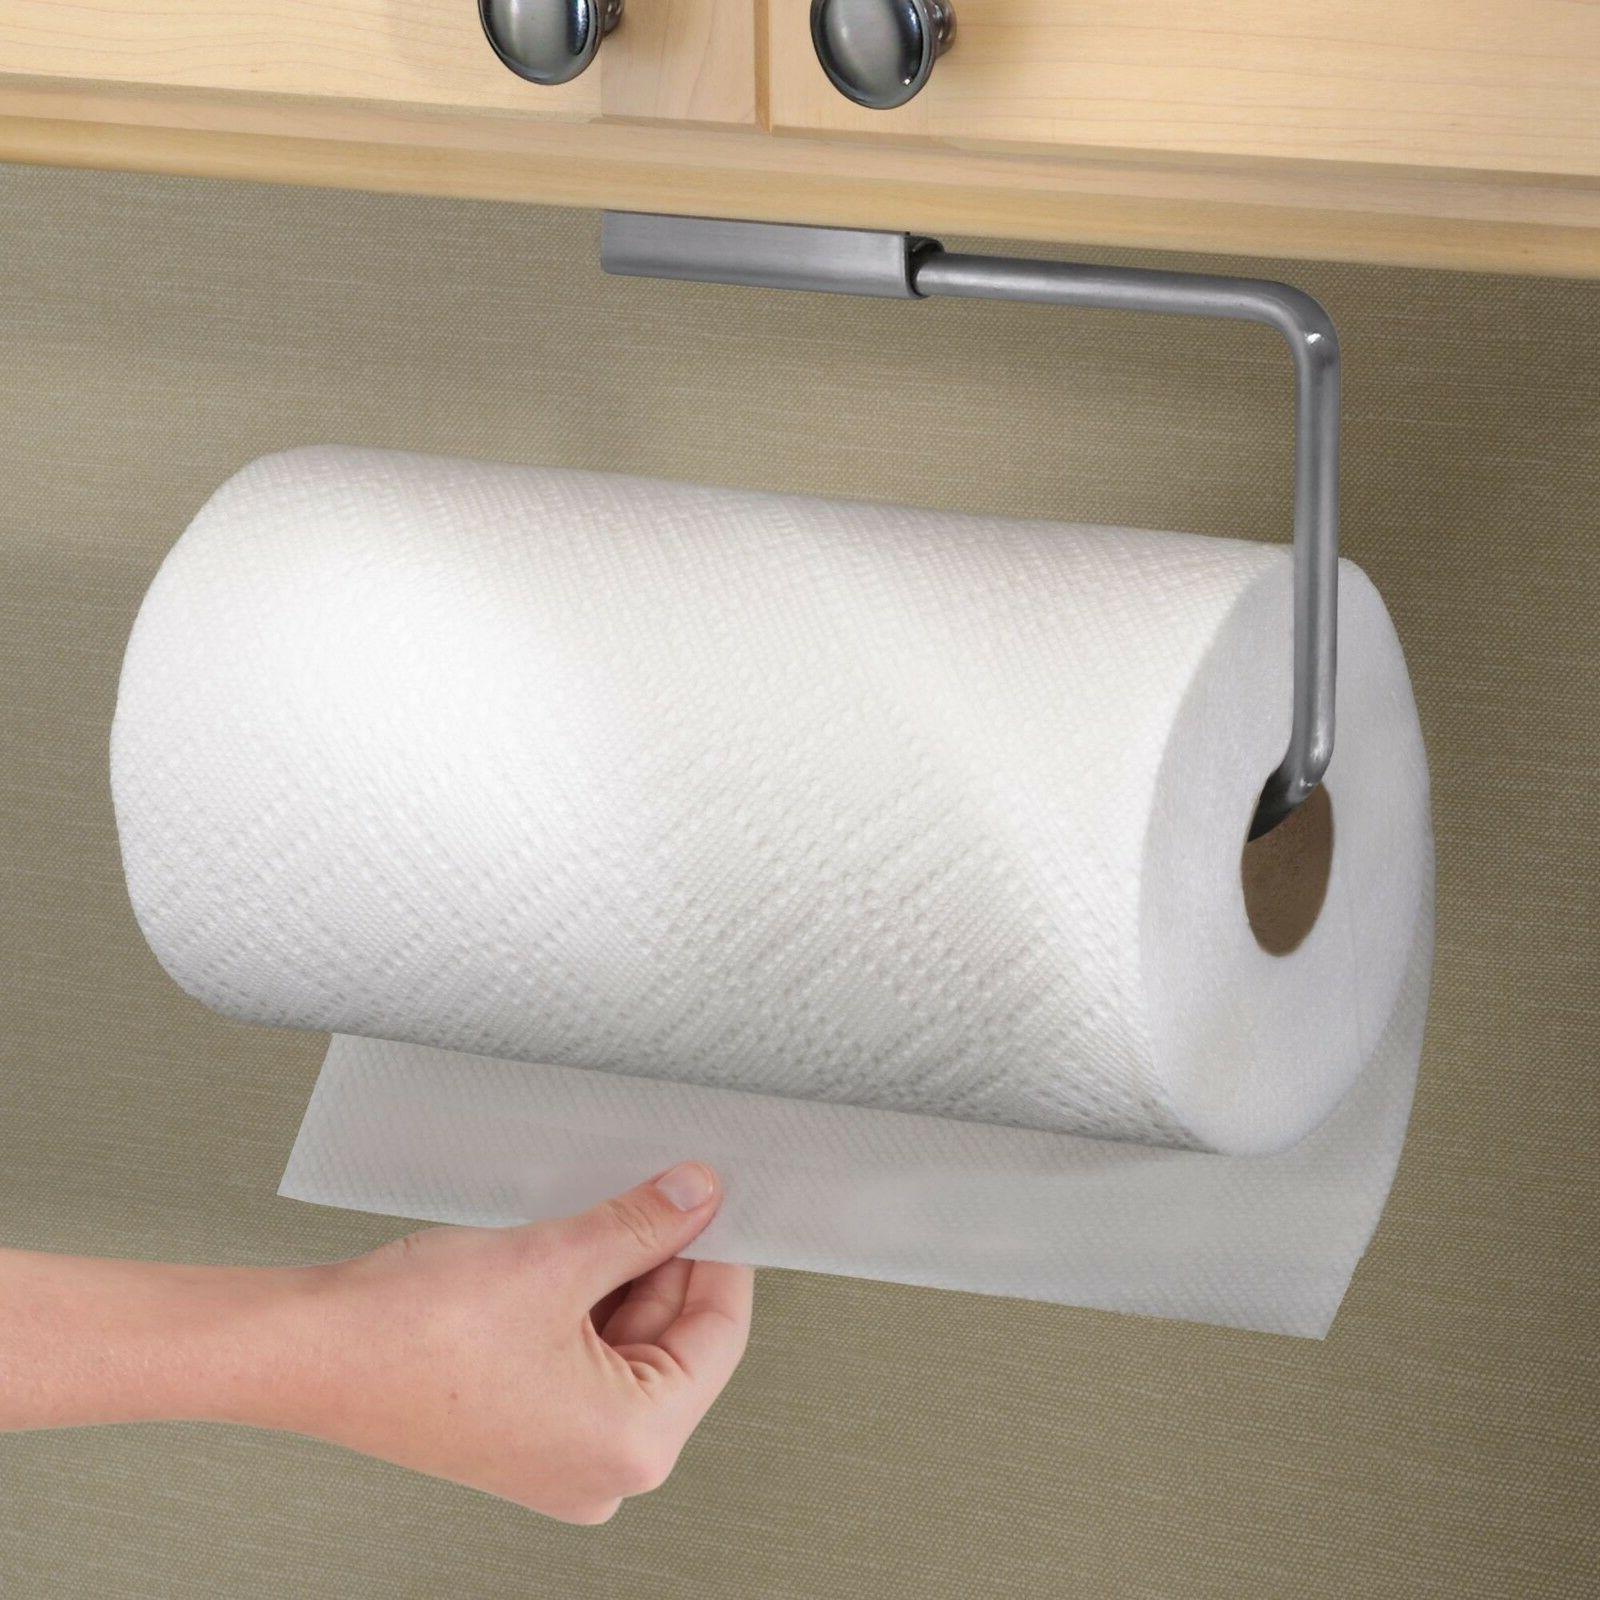 forma swivel paper towel holder for kitchen